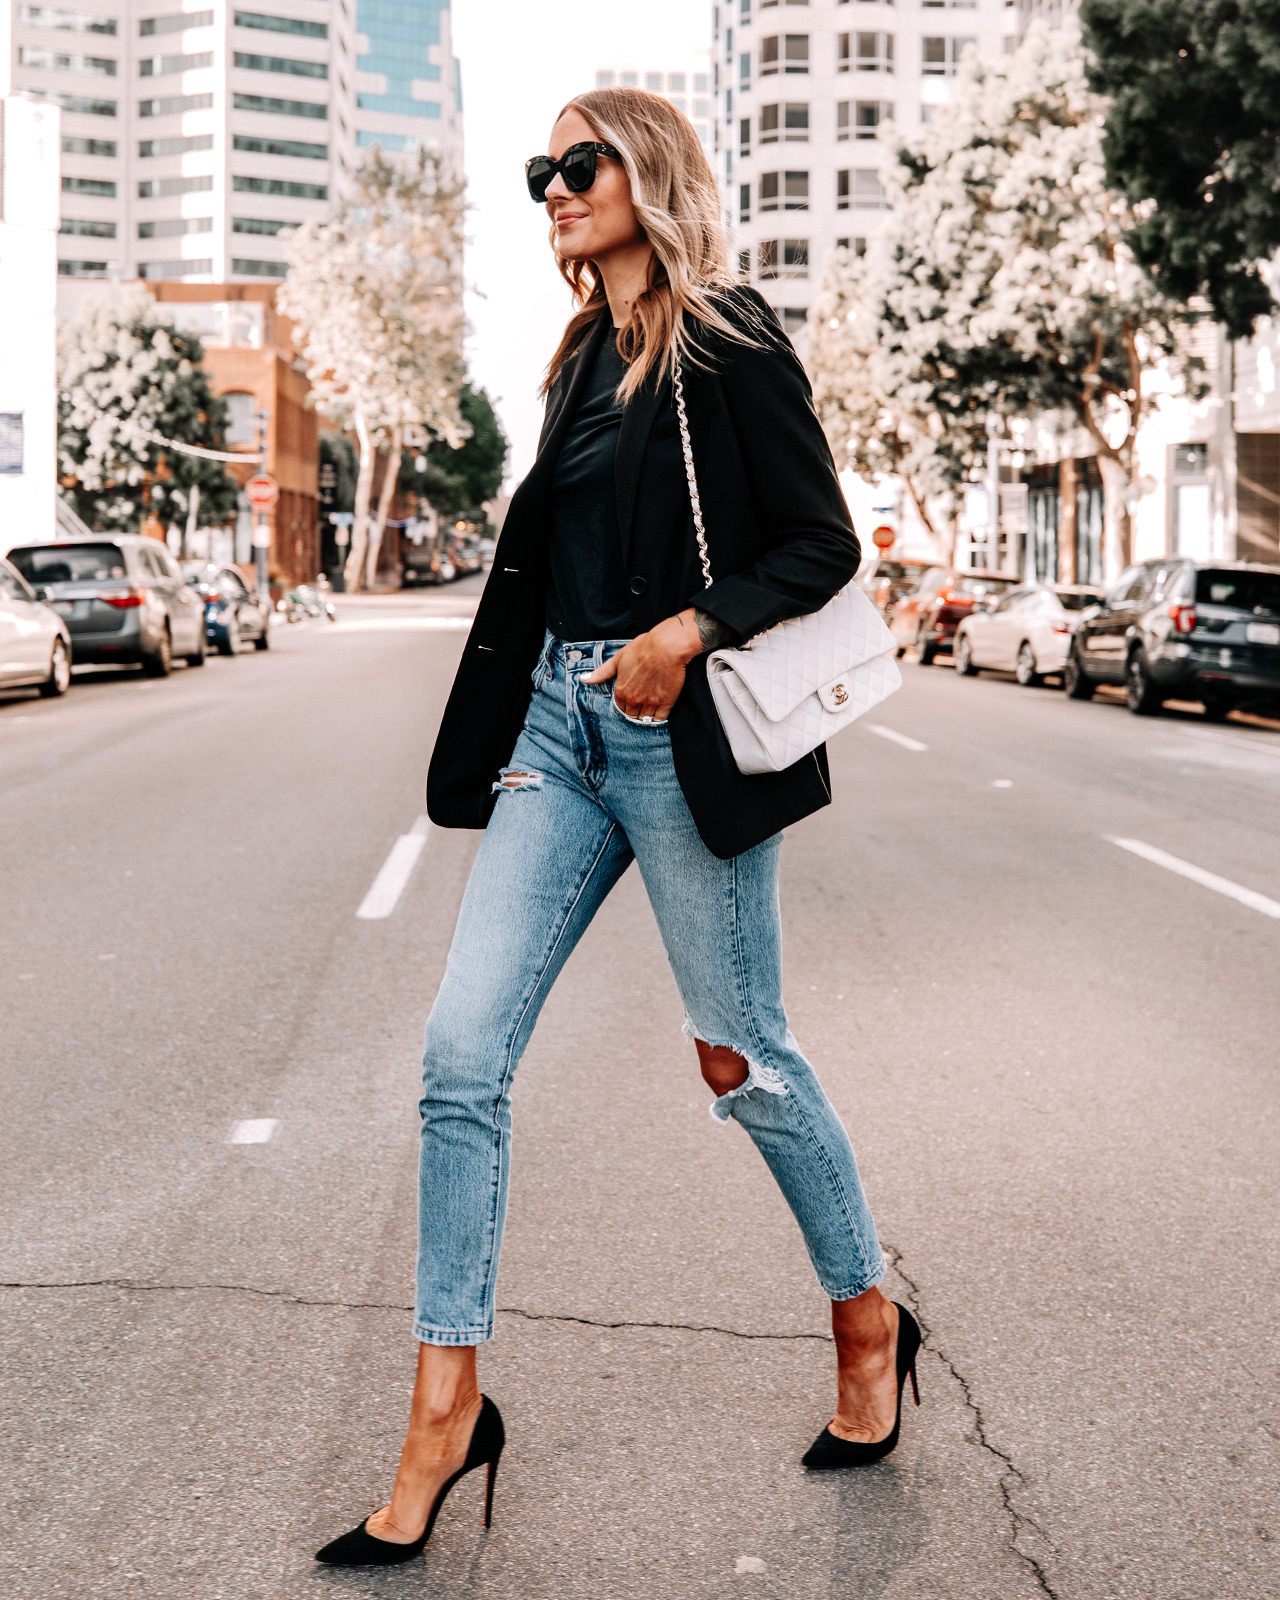 Fashion Jackson Wearing Everlane Black Blazer Black Tshirt Levis 501 Ripped Skinny Jeans Black Pumps Street Style